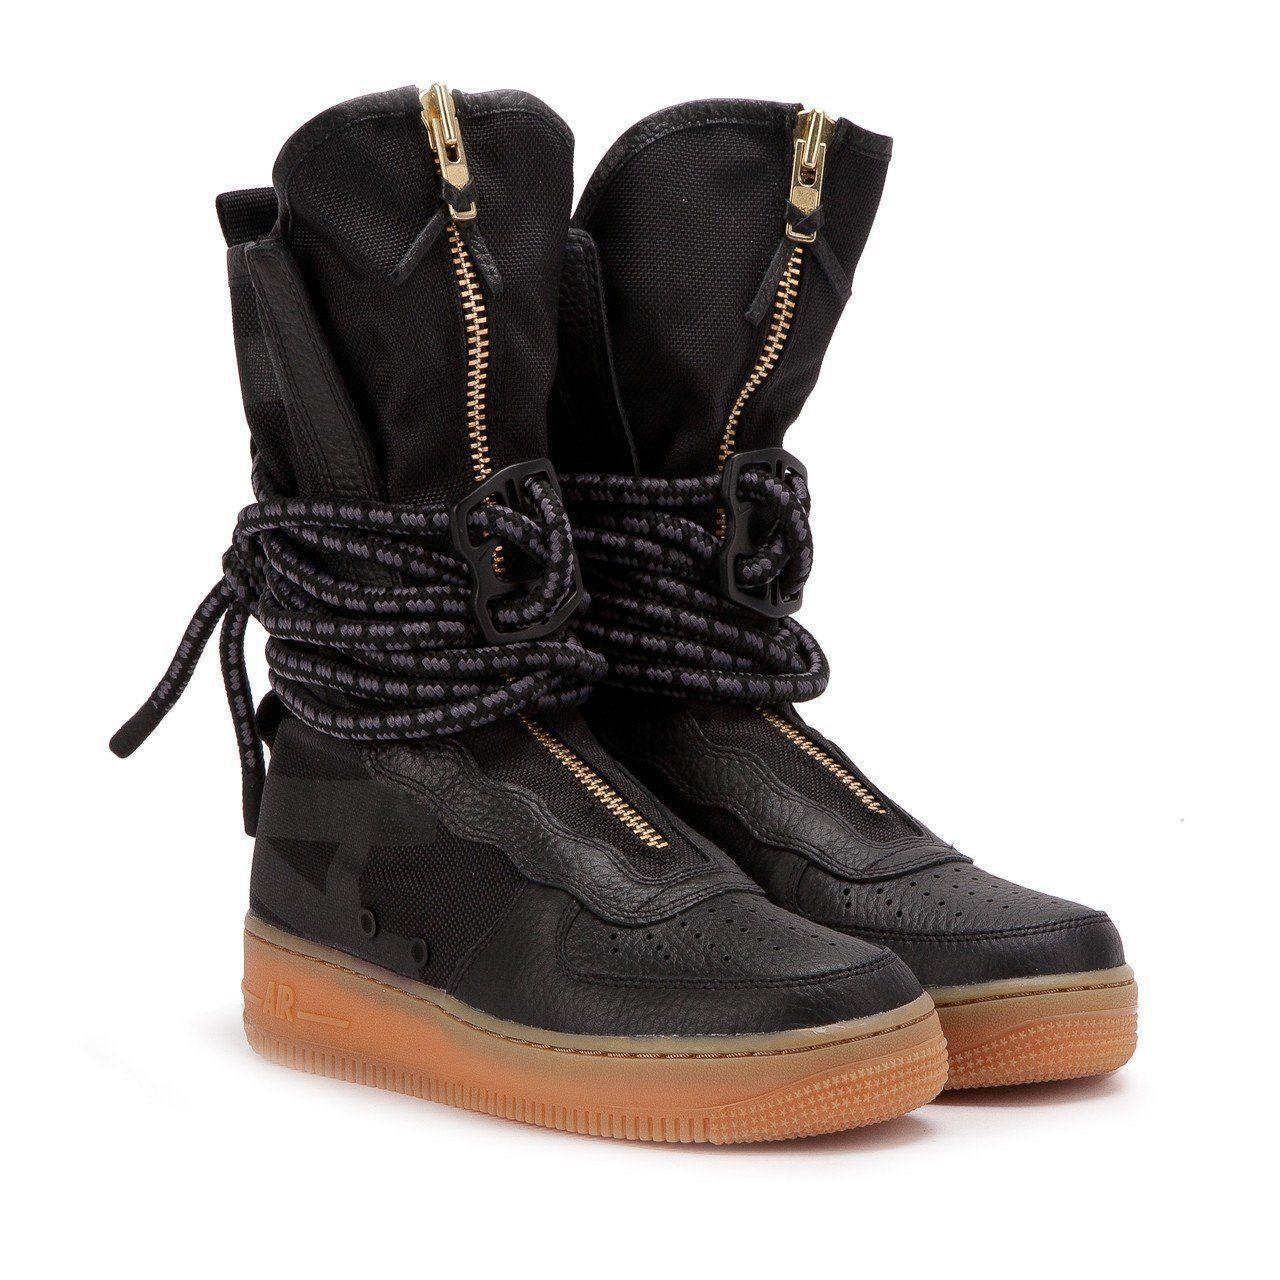 Nike Special Field SF Air Force 1 One High Black 11.5 Womens AA3965 001 RARE